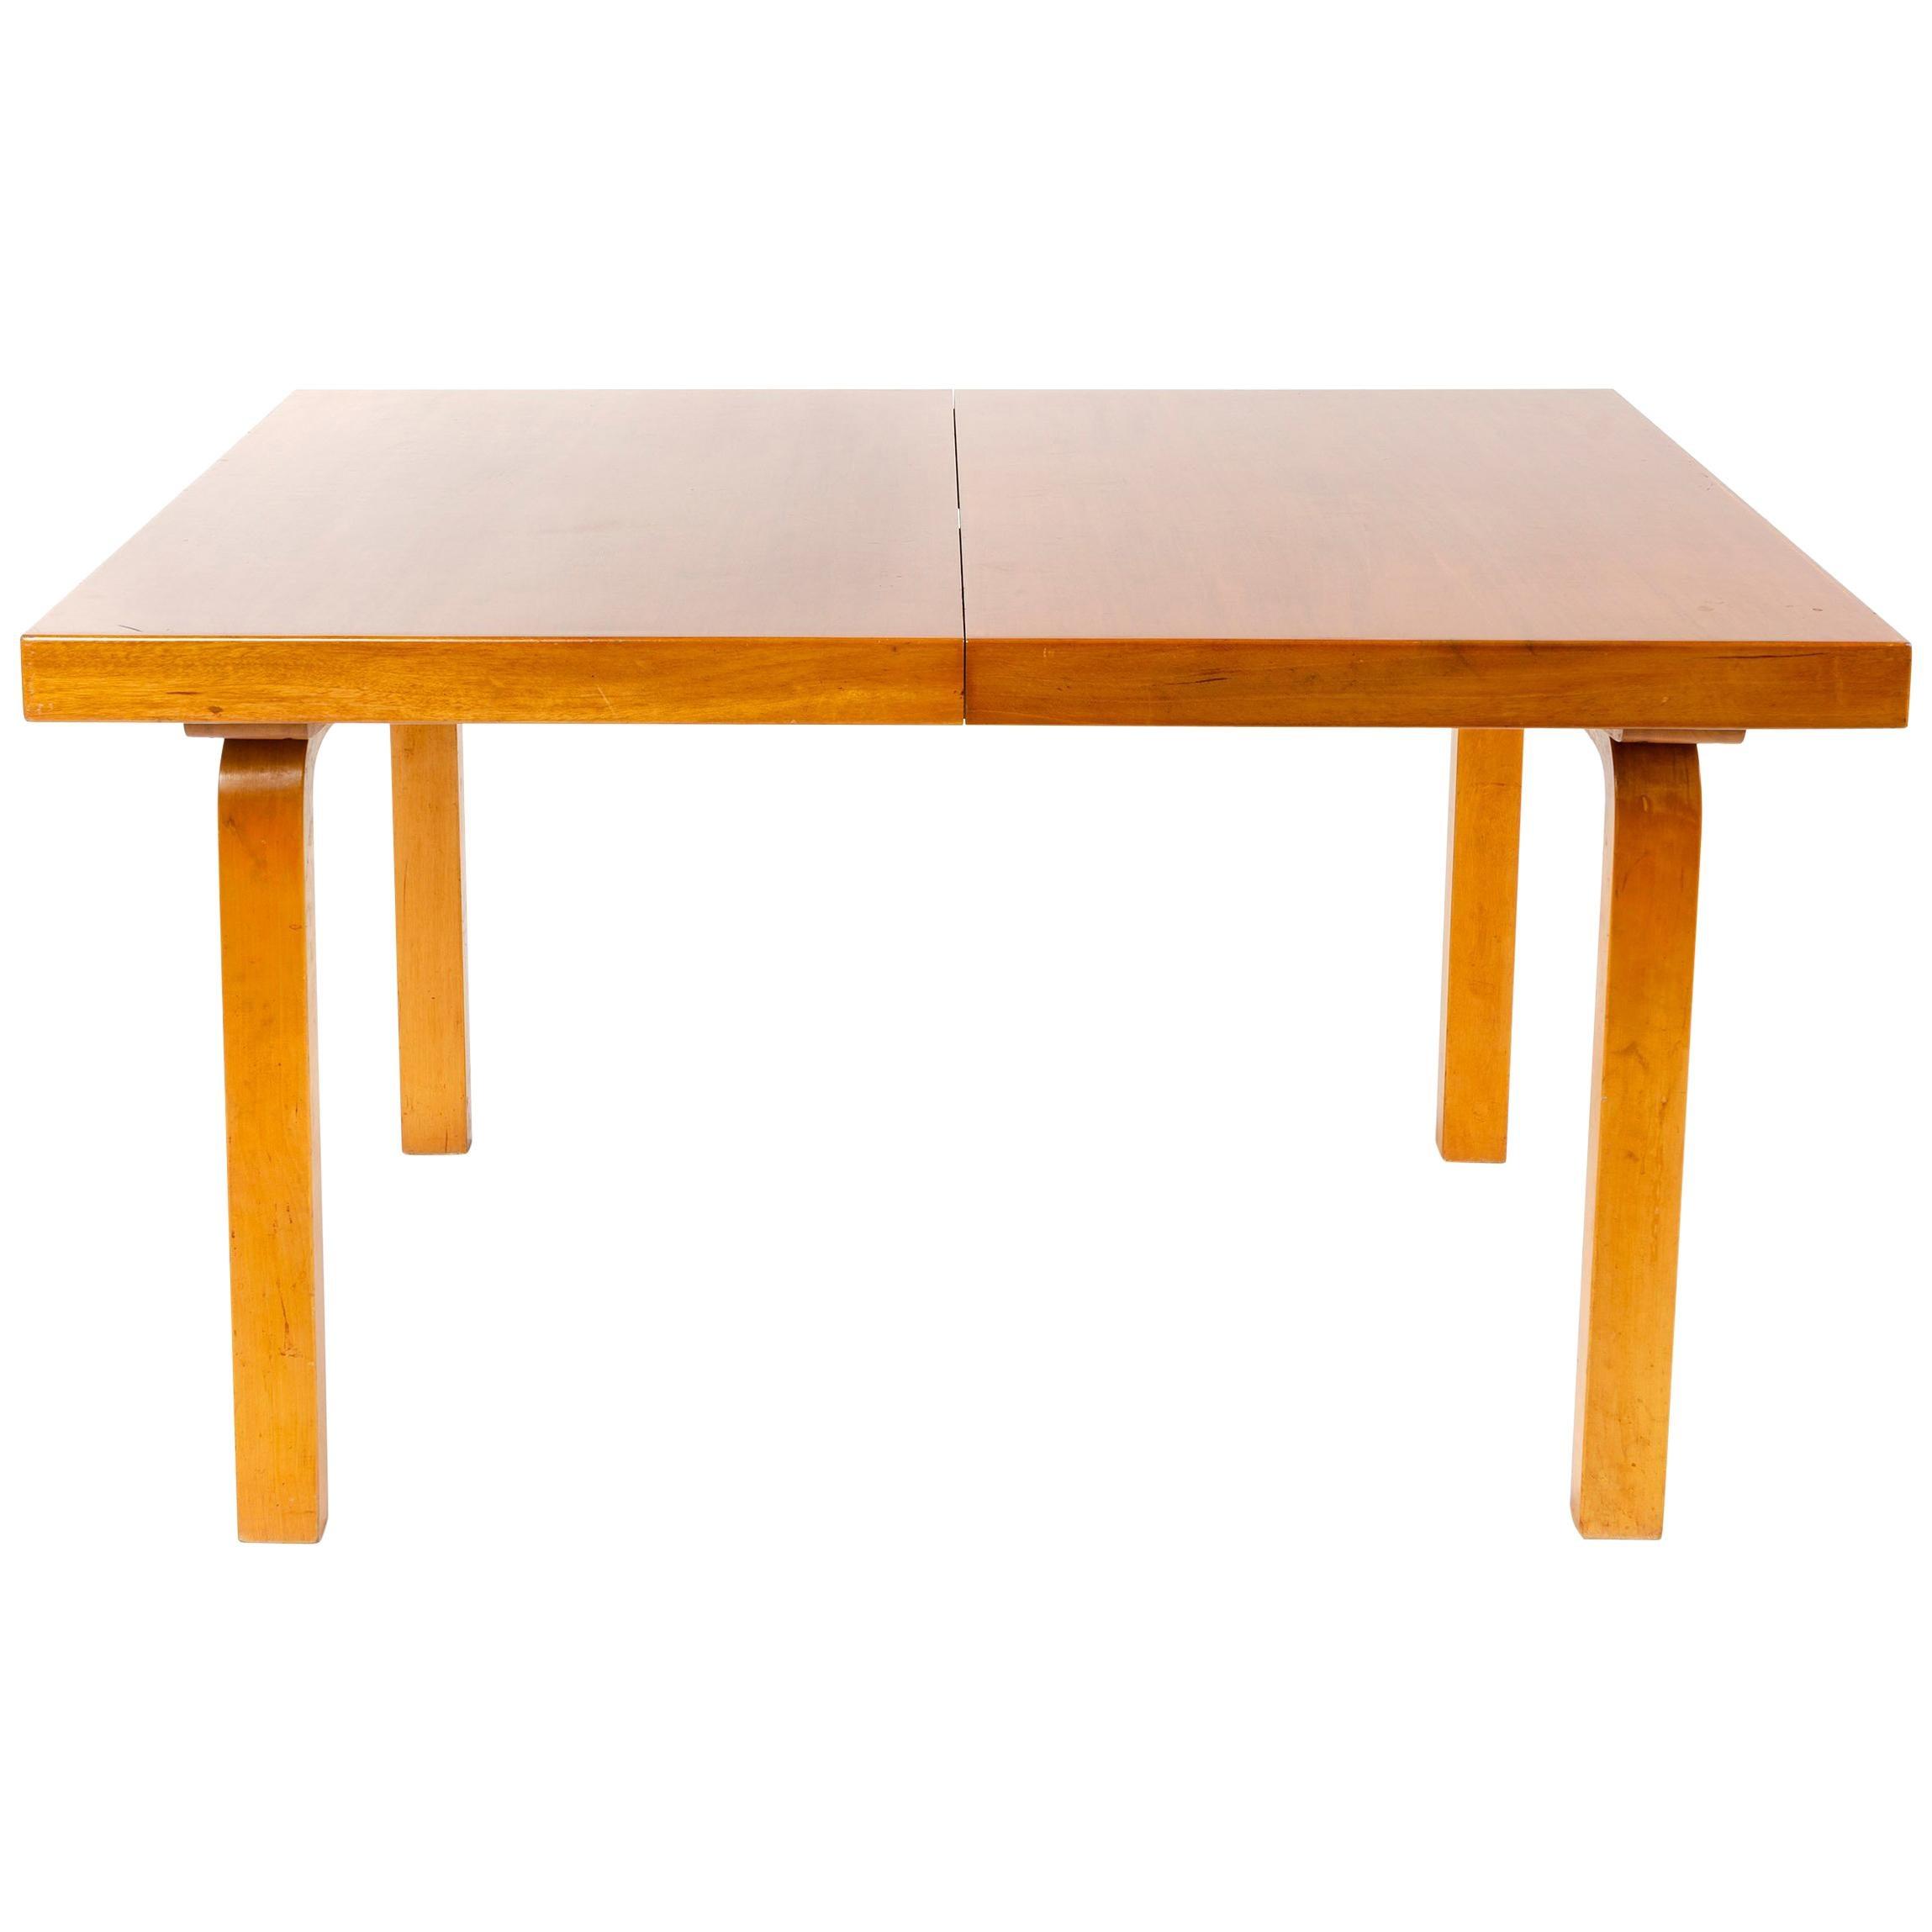 1940s Finnish Birch Extention Table by Alvar Aalto for Artek